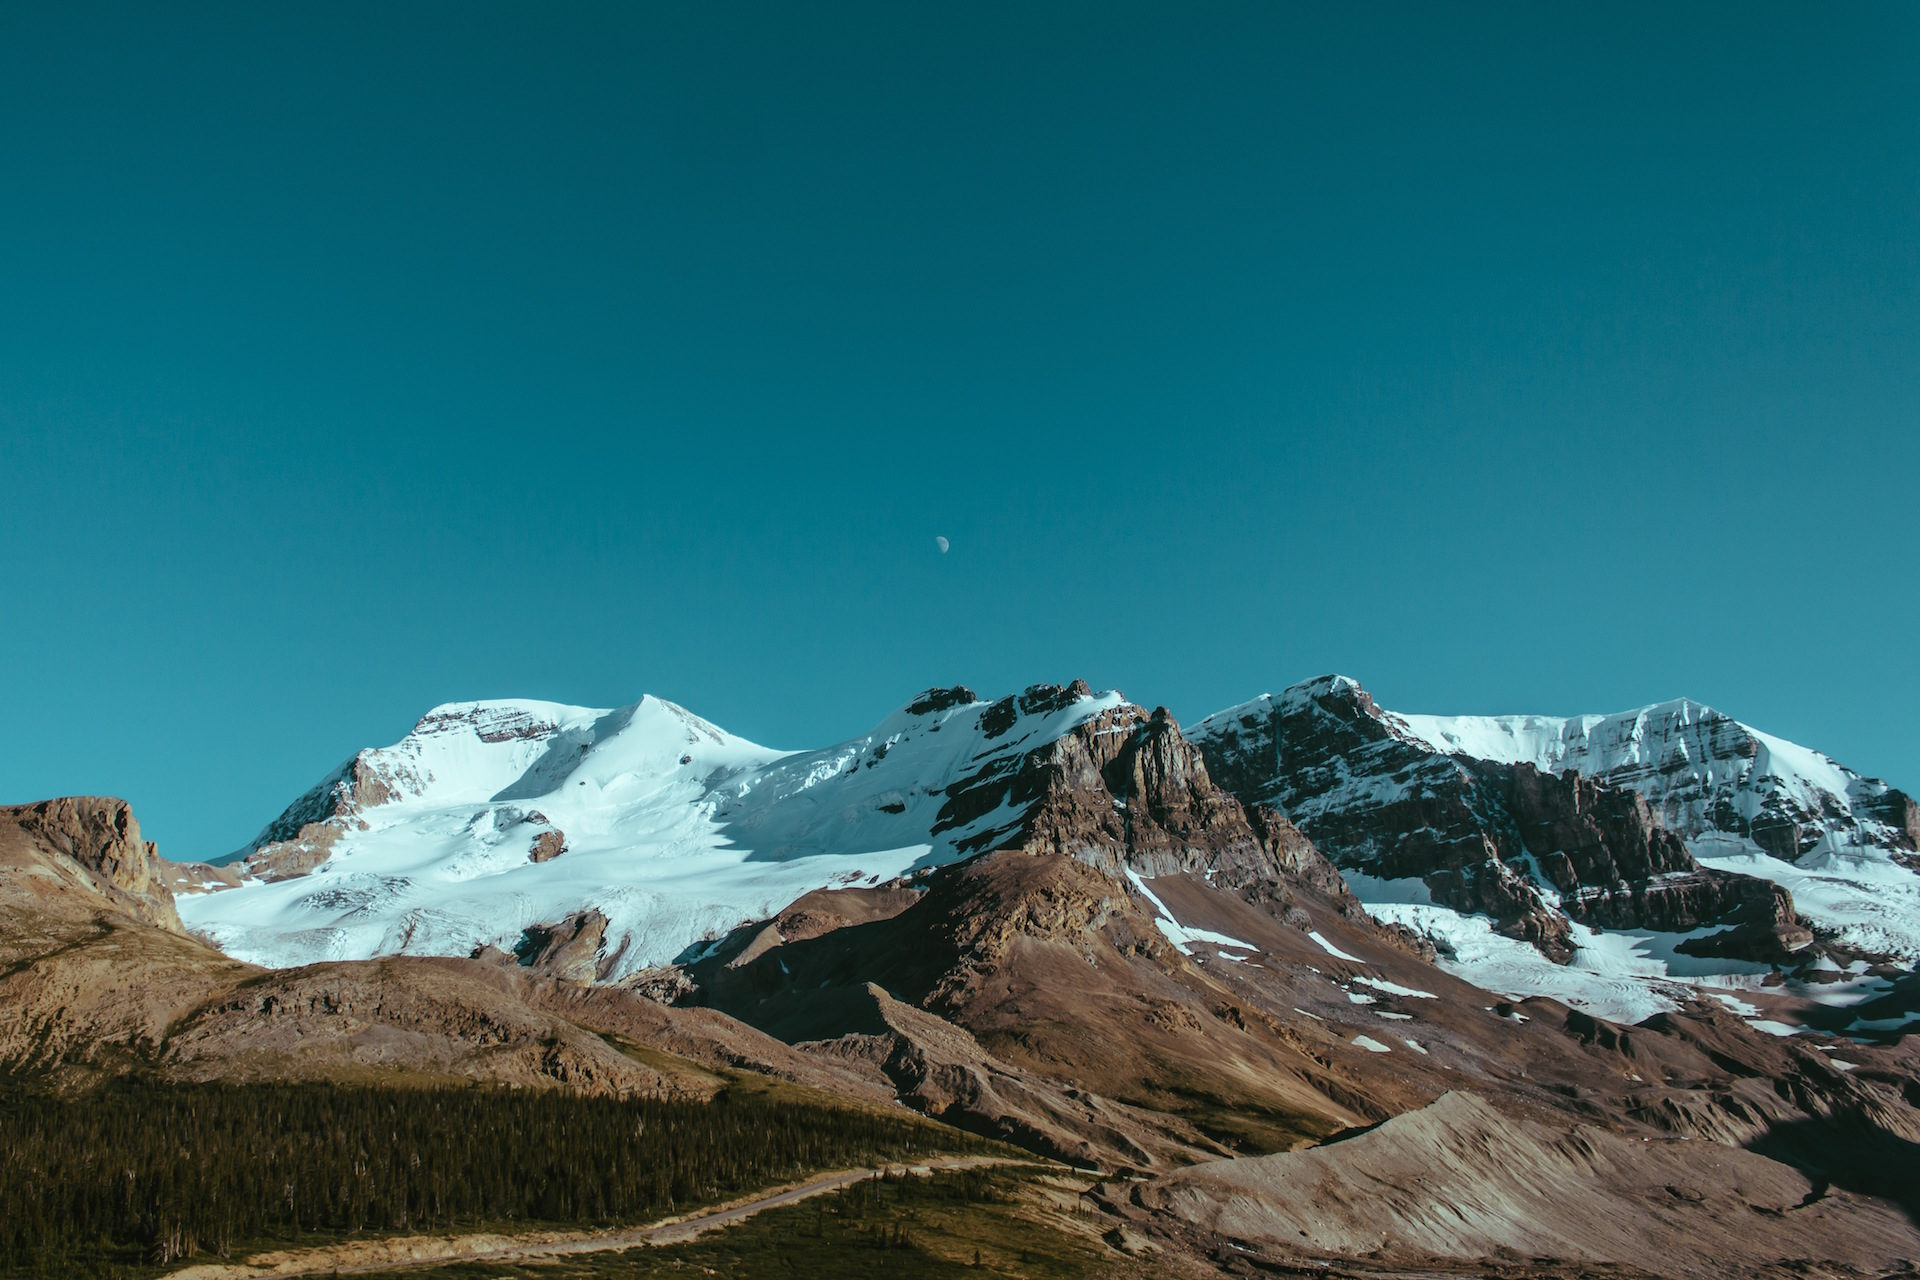 Montañas, Schnee, Himmel, Mond, Nevada - Wallpaper HD - Prof.-falken.com